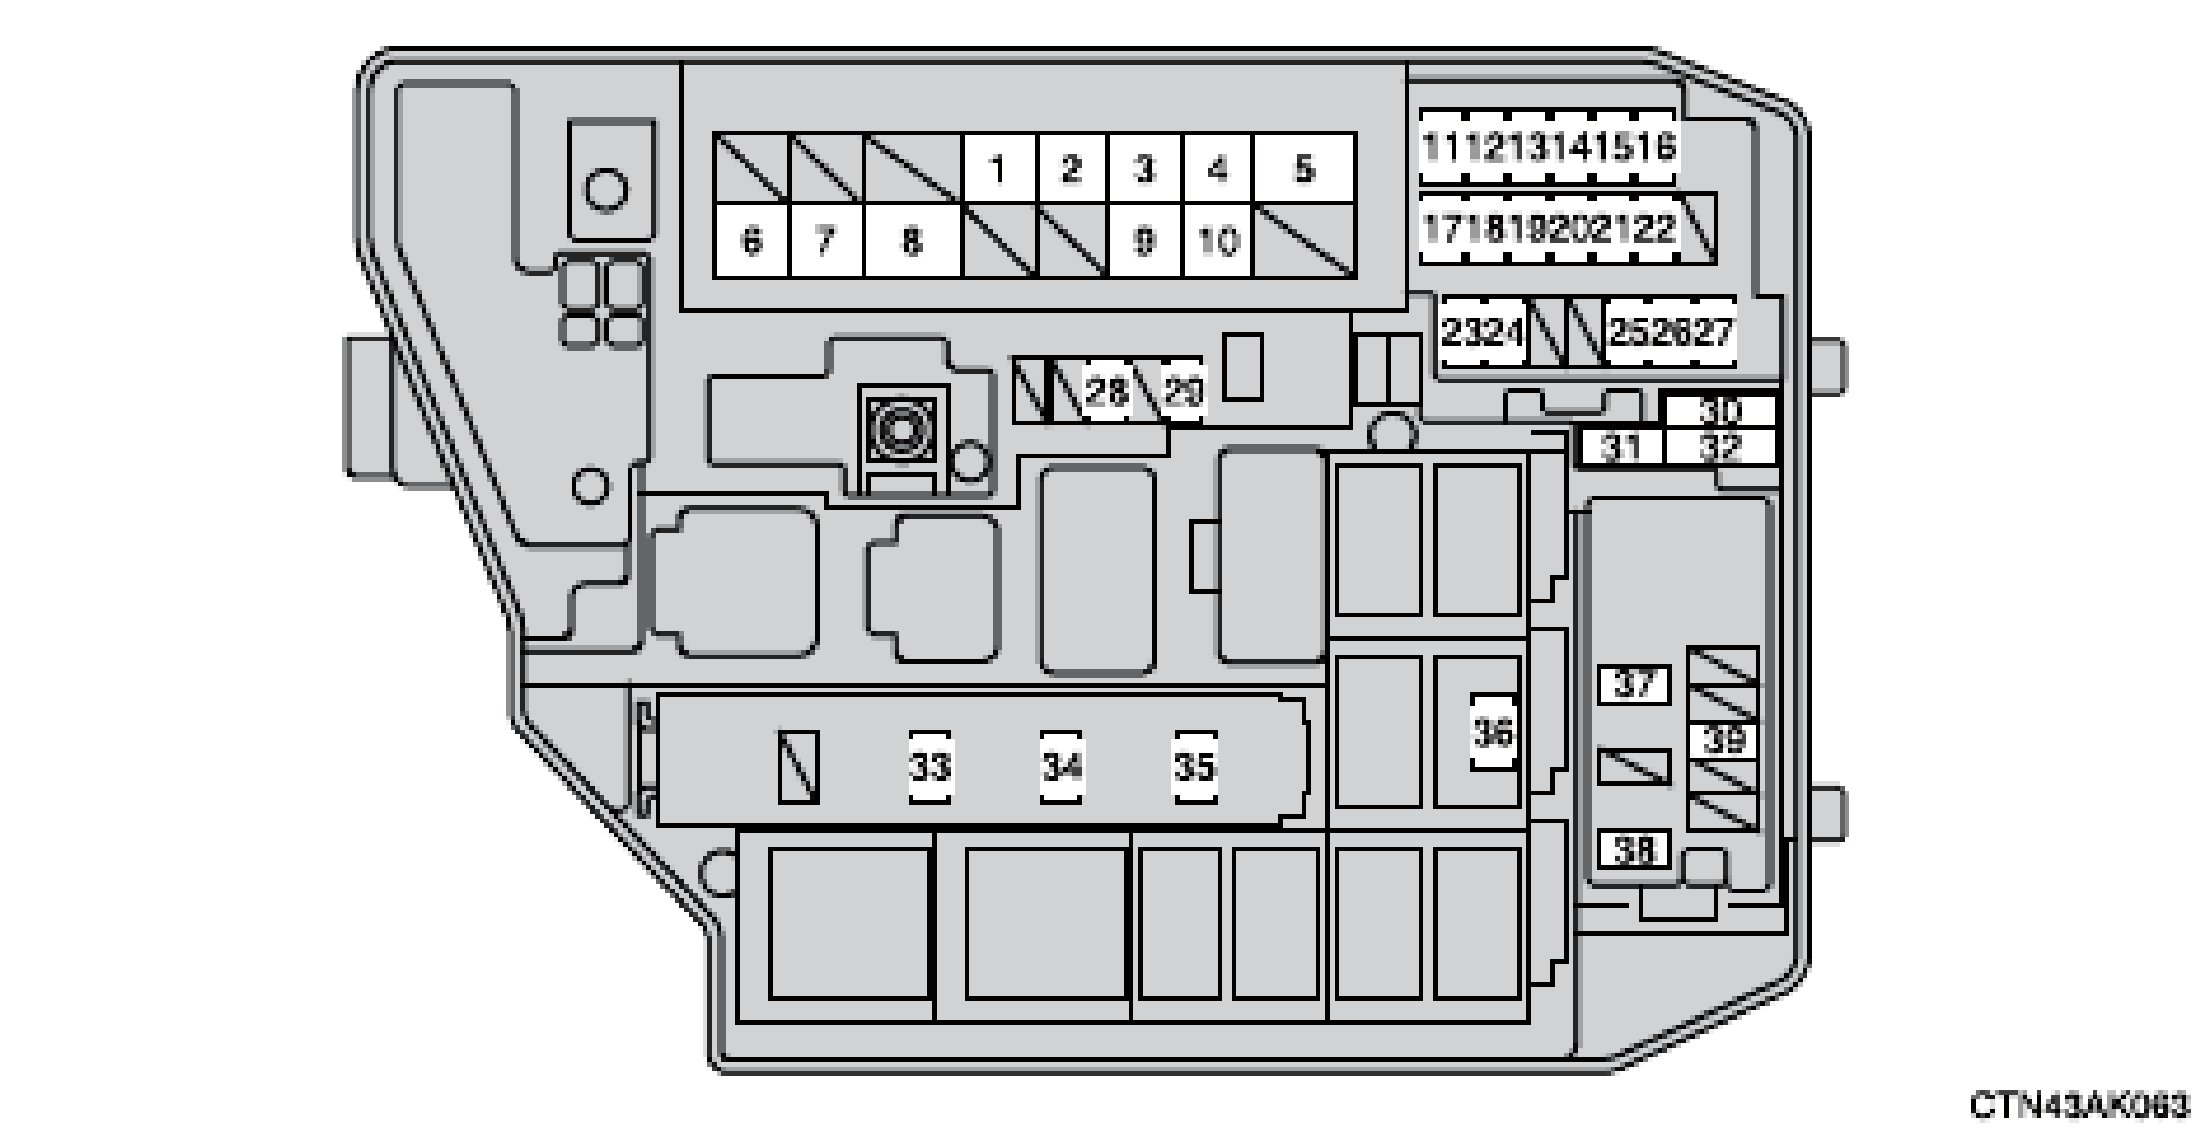 [DIAGRAM_5NL]  MX_5691] Fuse Box Location Furthermore 2003 Toyota Highlander Fuse Box  Diagram Free Diagram | 2006 Highlander Hybrid Fuse Box Location |  | Wida Weasi Iosco Gue45 Mohammedshrine Librar Wiring 101